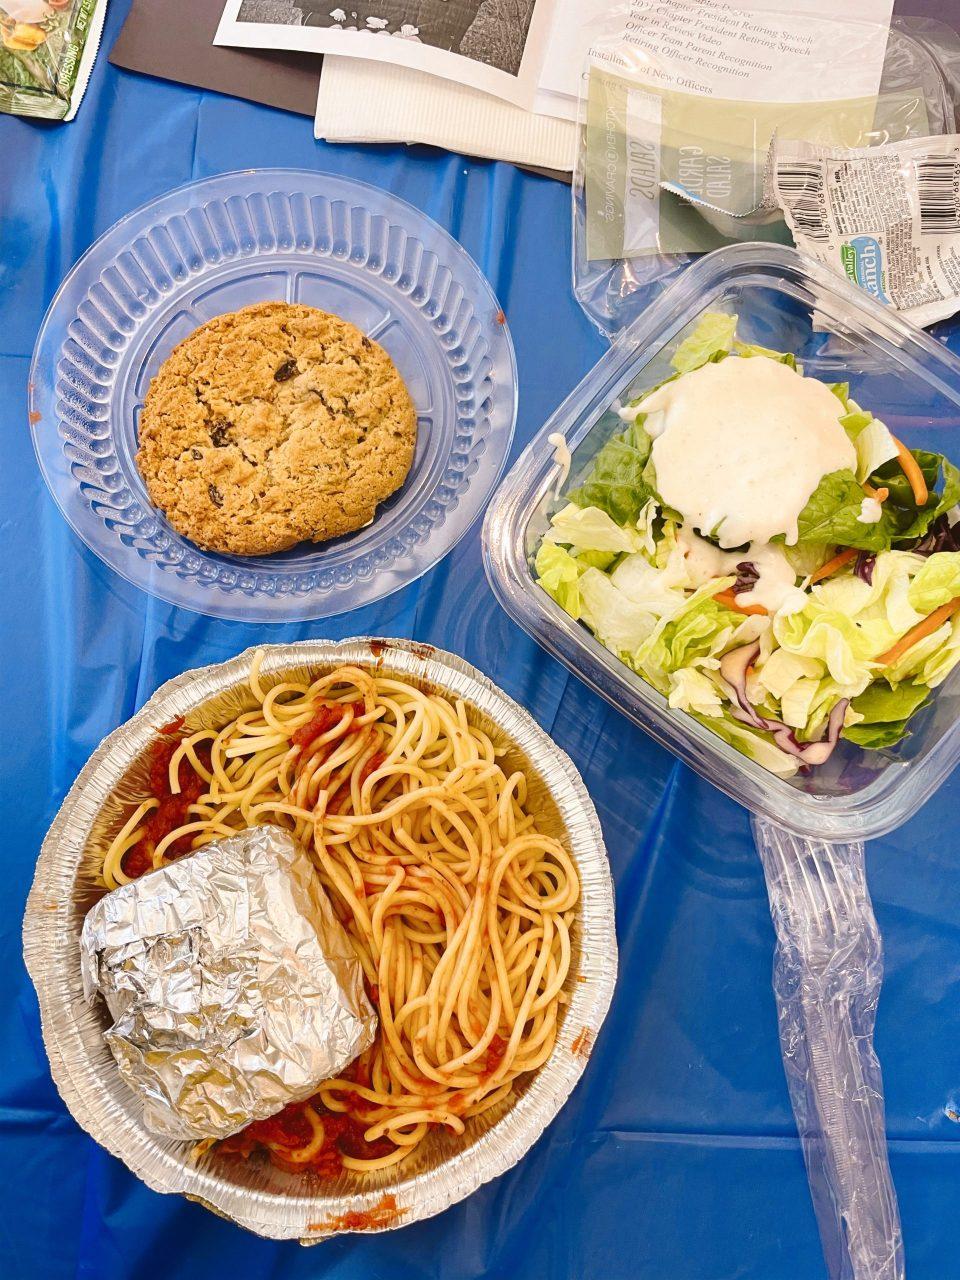 spaghetti dinner during covid 19